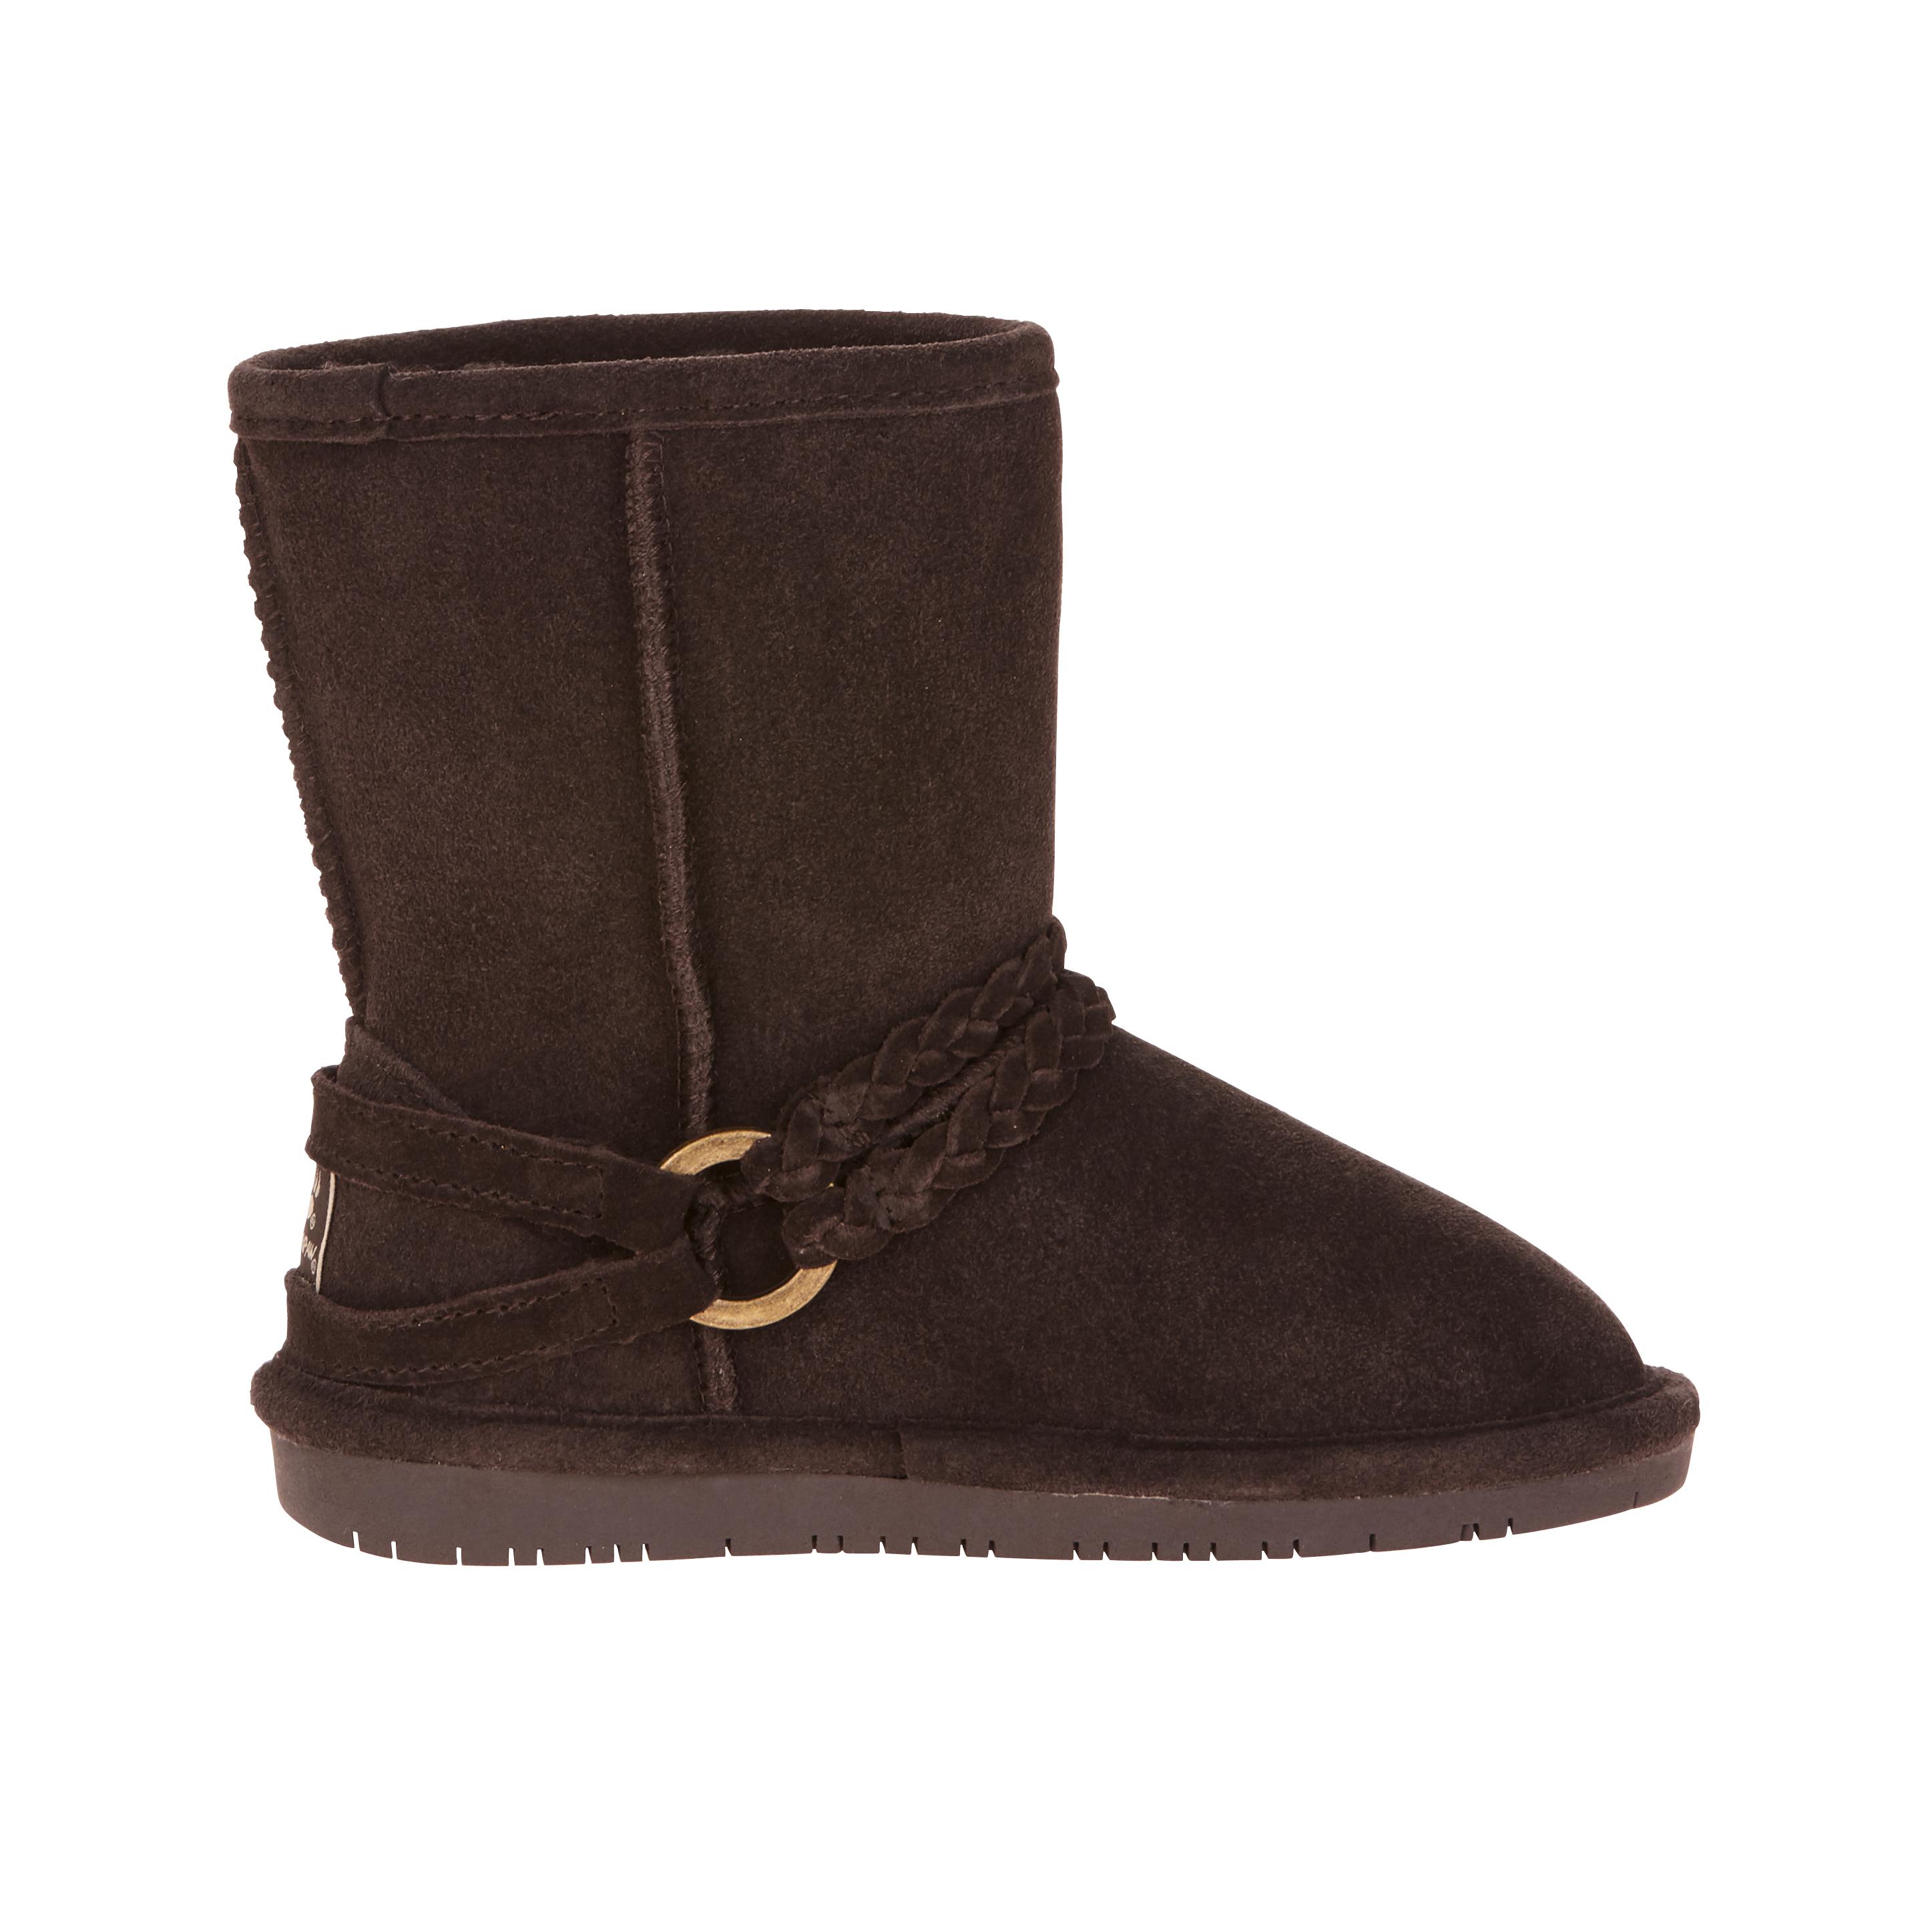 Image of Bearpaw Youth Adele Boot